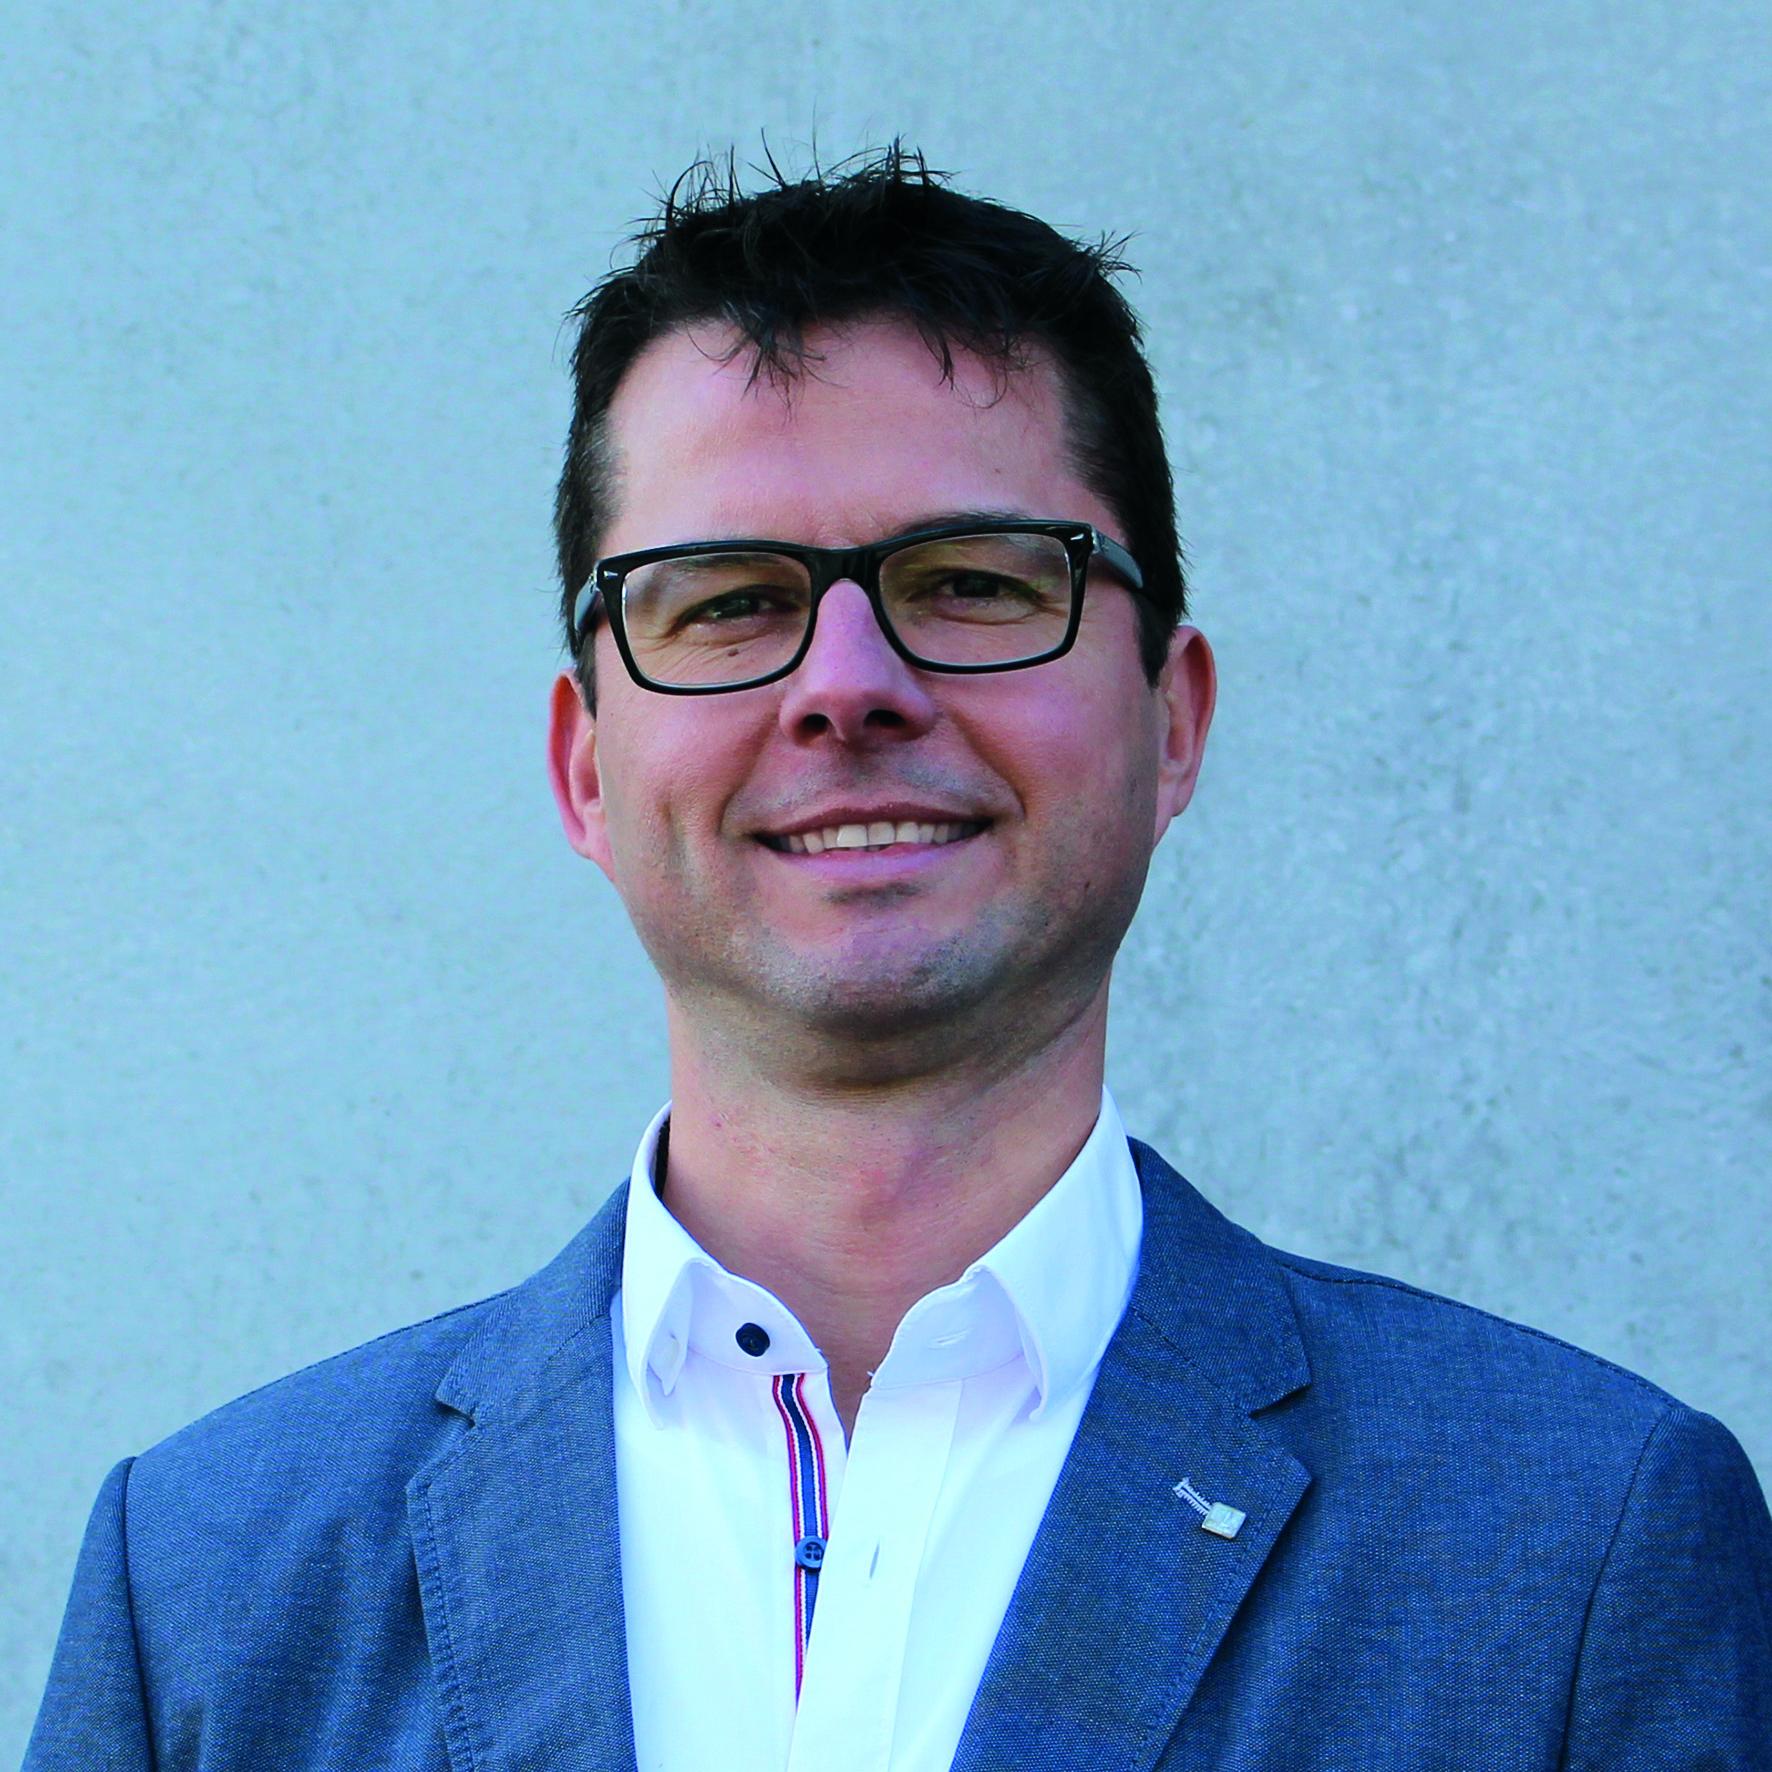 Thorsten Betz, Head of Technical Office Wind at Max Bögl